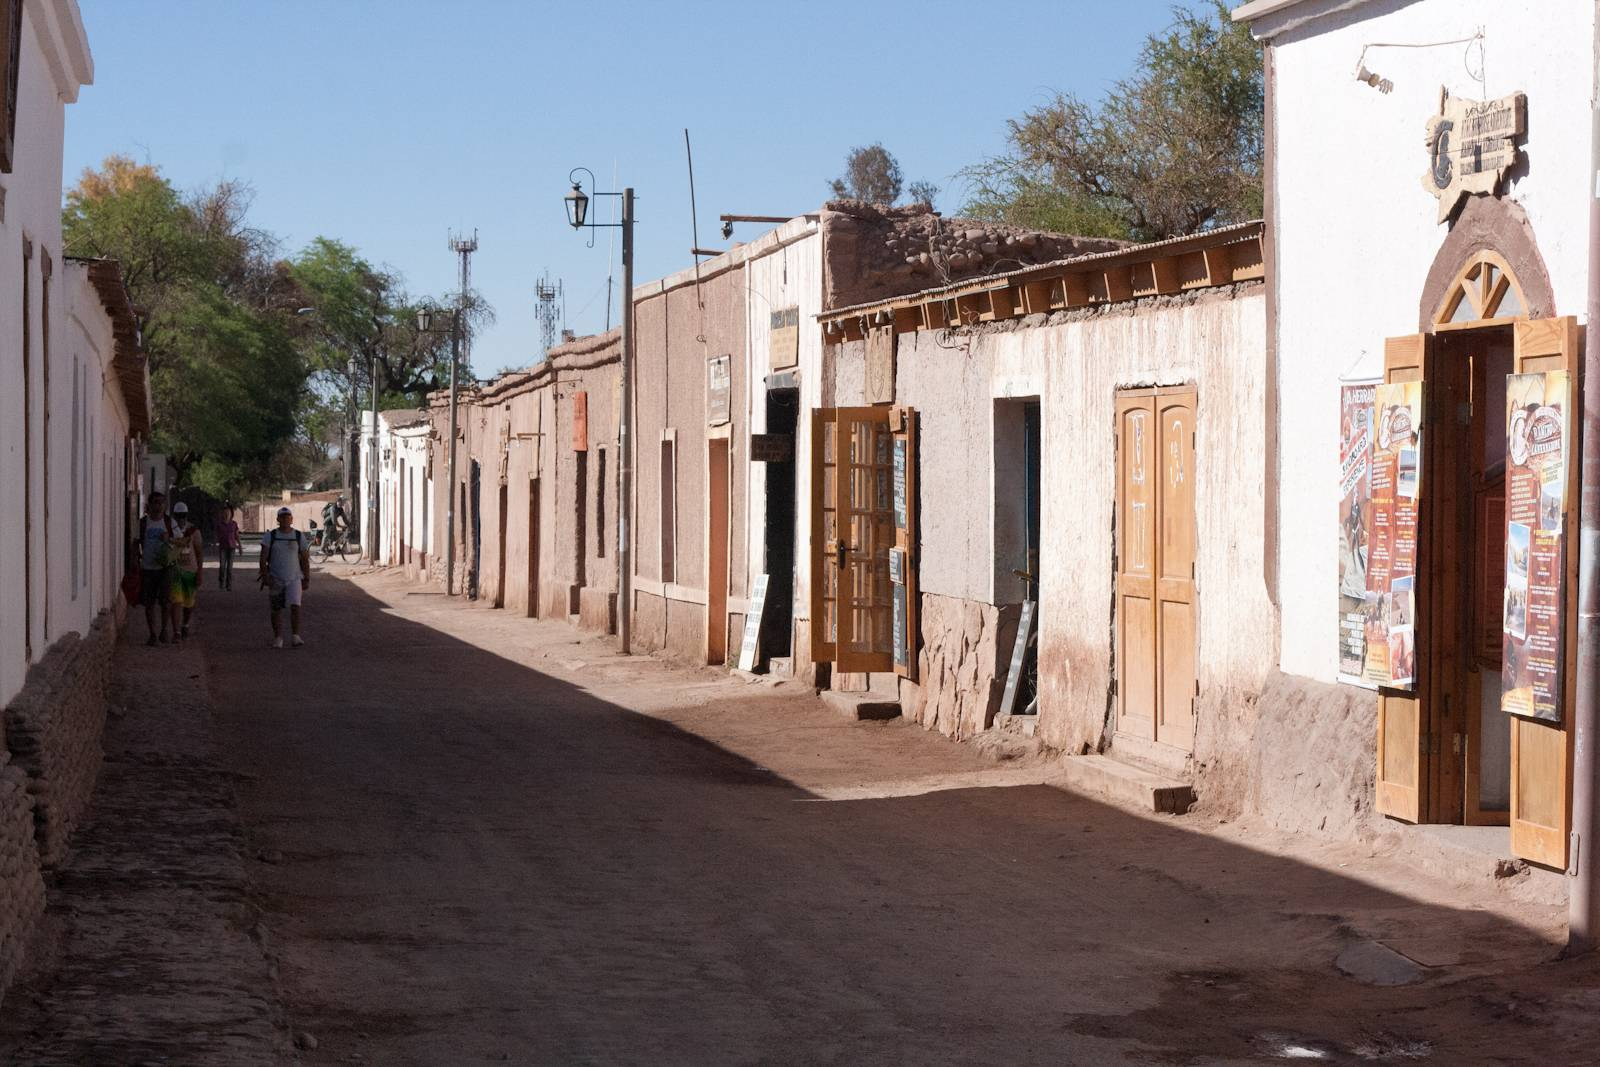 Photo 3: San Pedro de Atacama